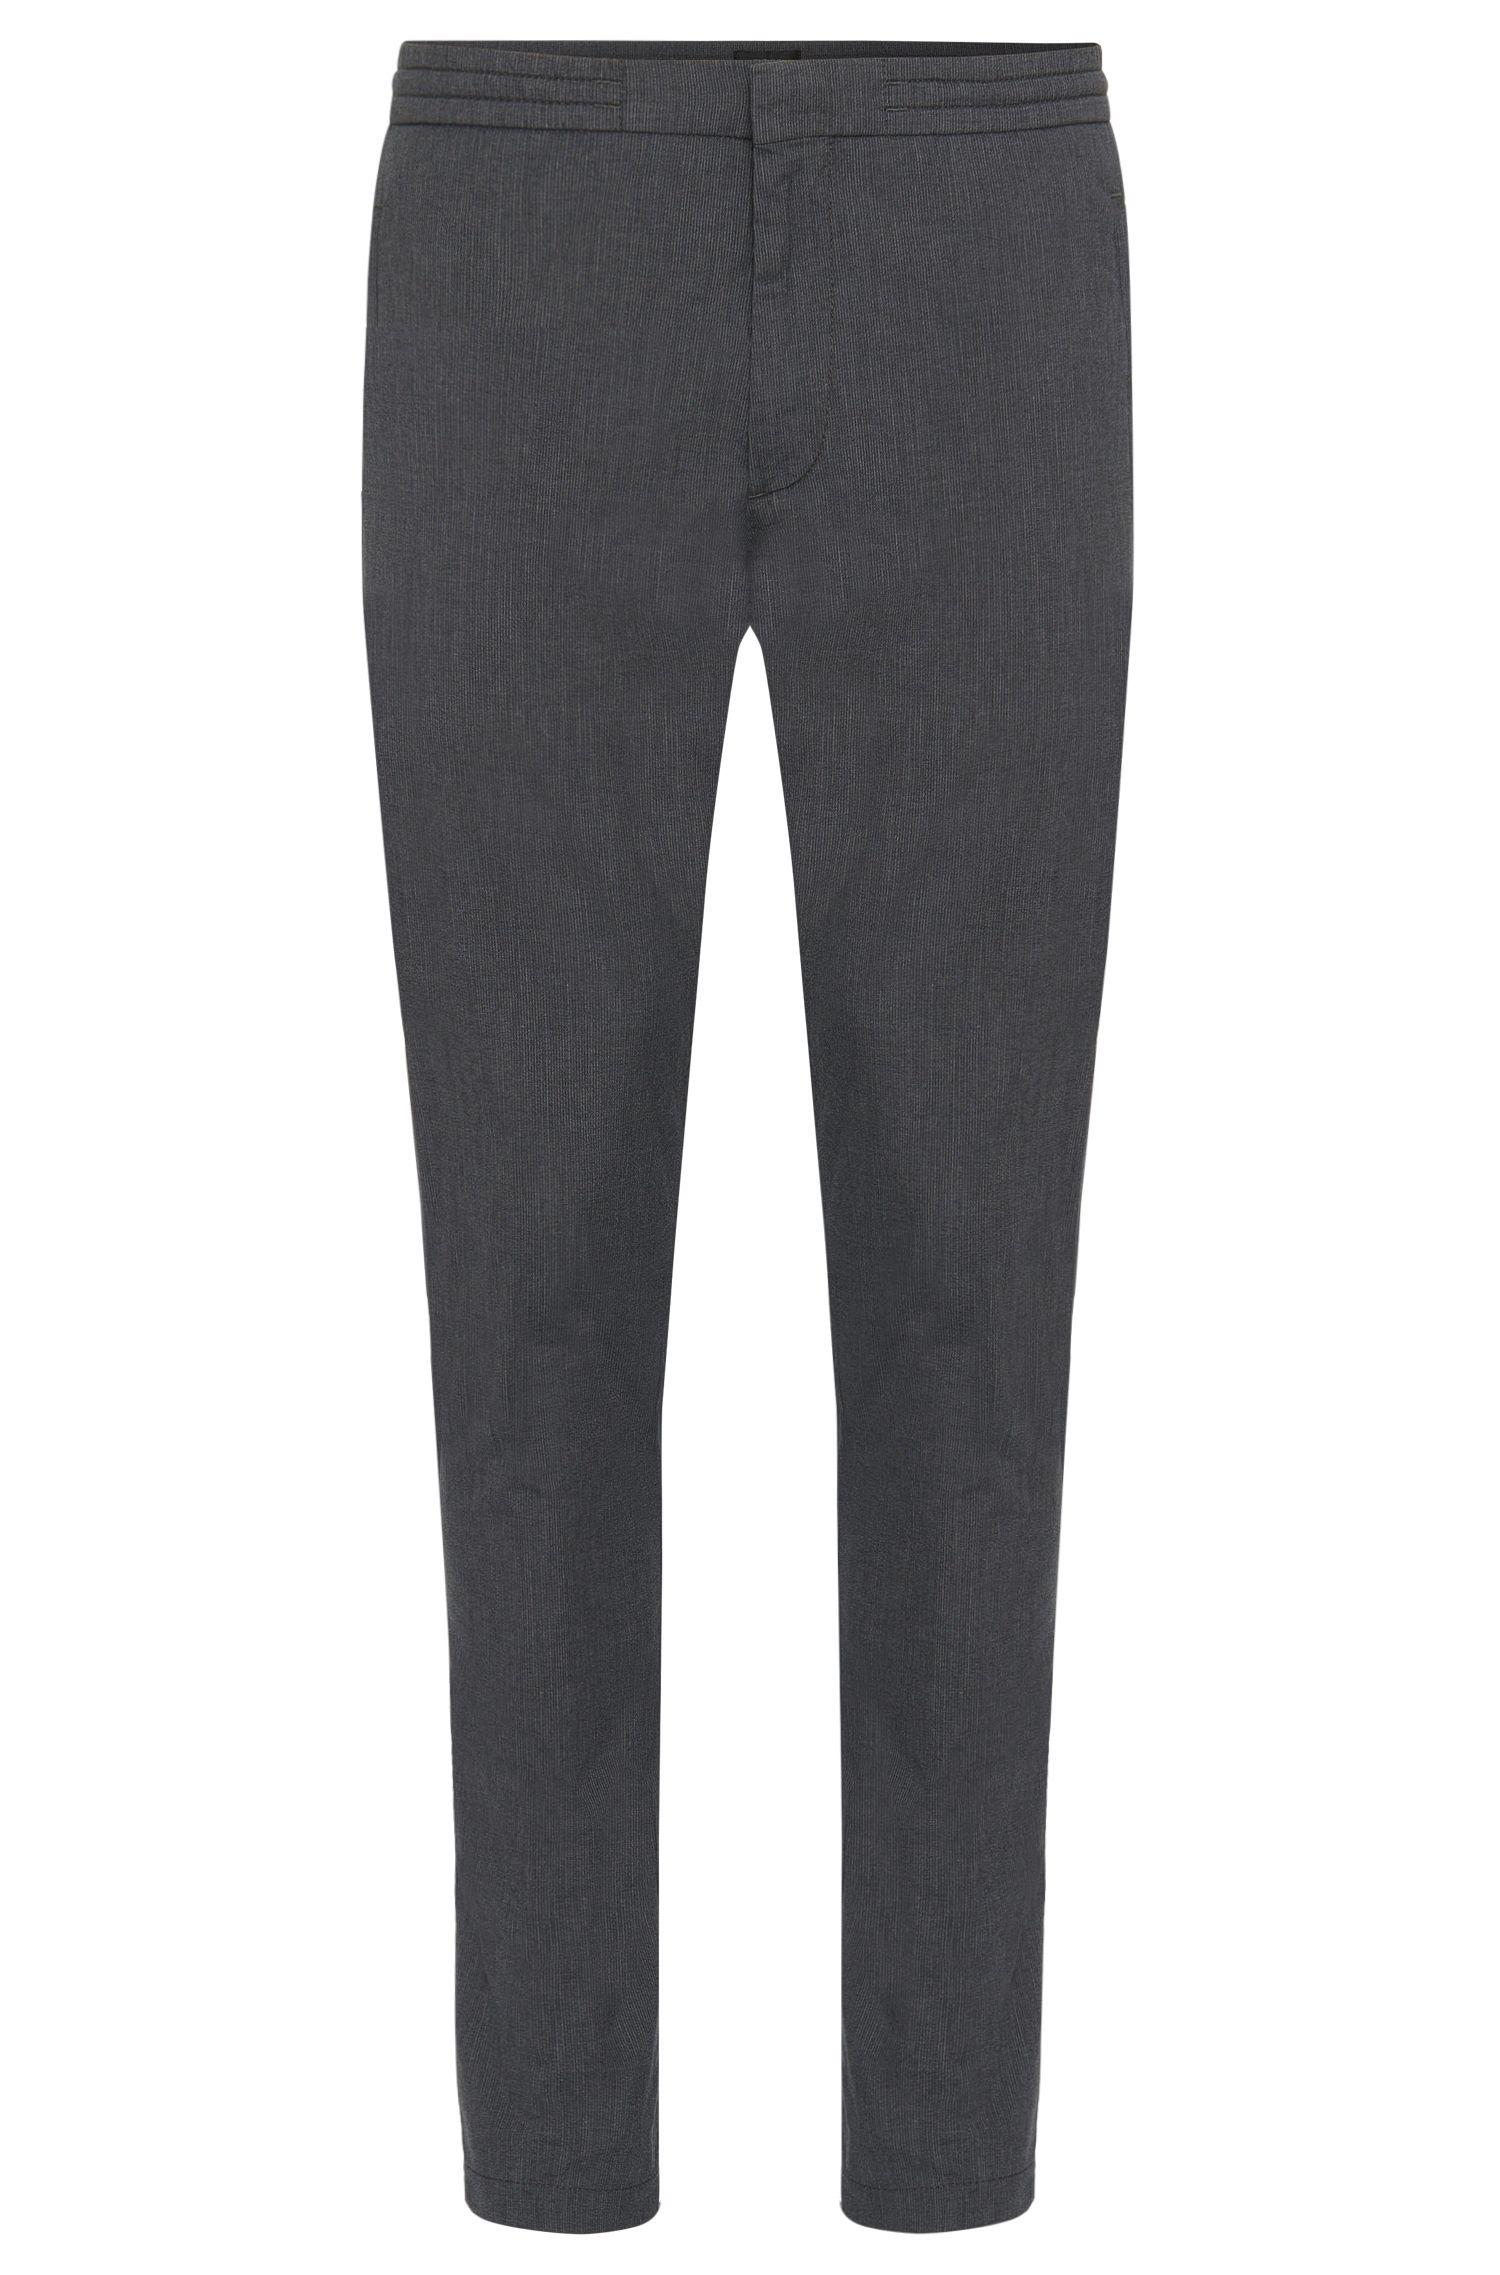 Stretch Cotton Blend Drawstring Pants, Extra Slim Fit | Kito Drawstring W